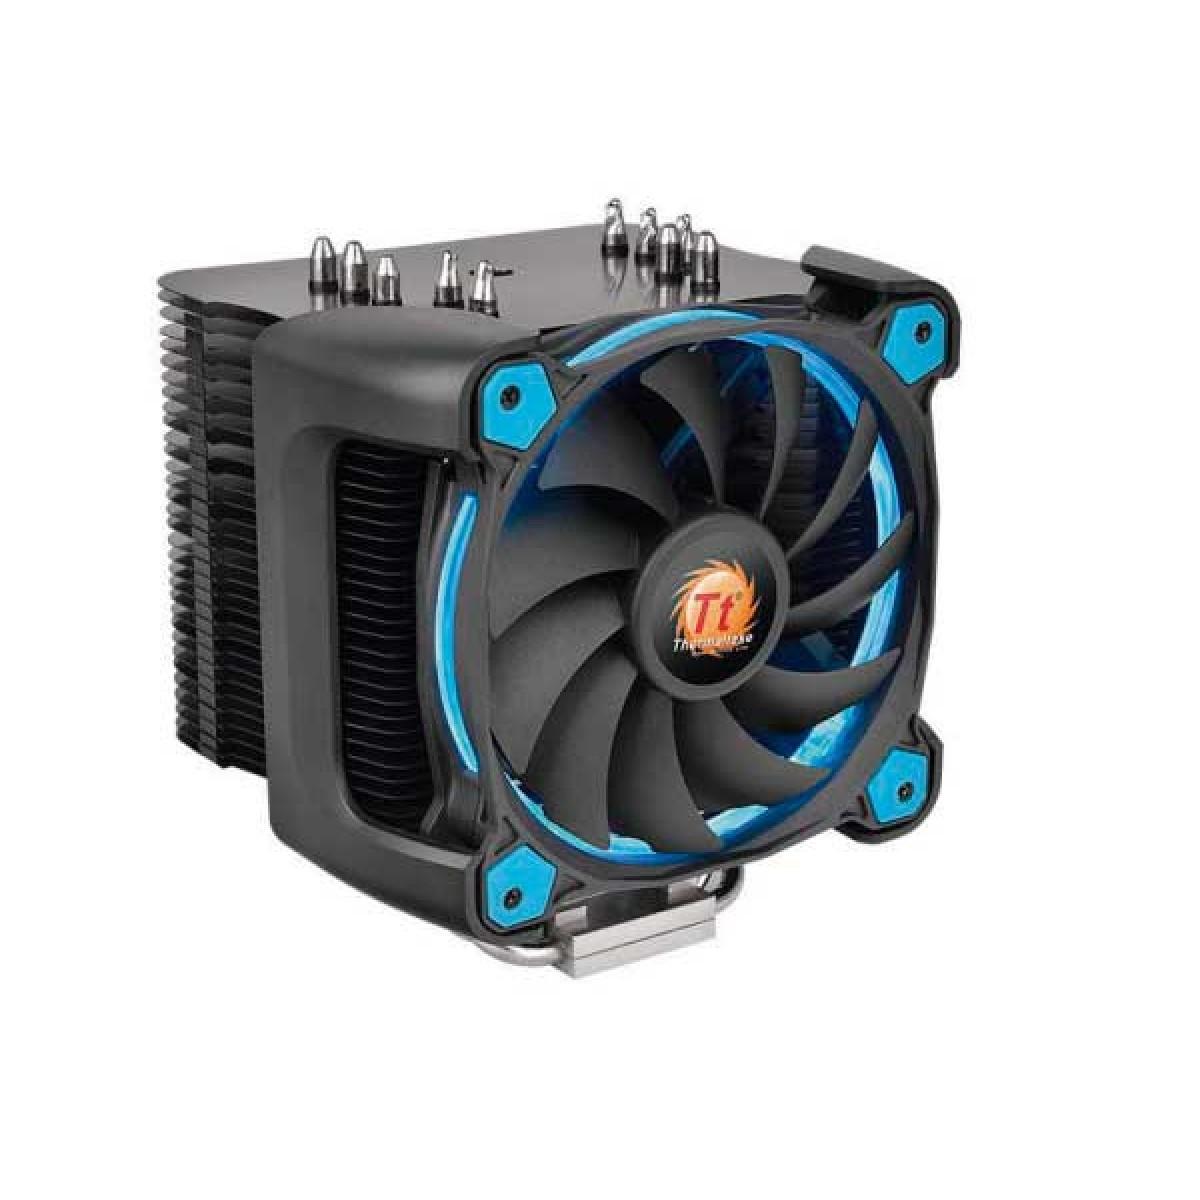 Cooler para Processador Thermaltake Riing SILENT 12 PRO, Blue 120mm, Intel-AMD, CL-P021-CA12BU-A - Open Box